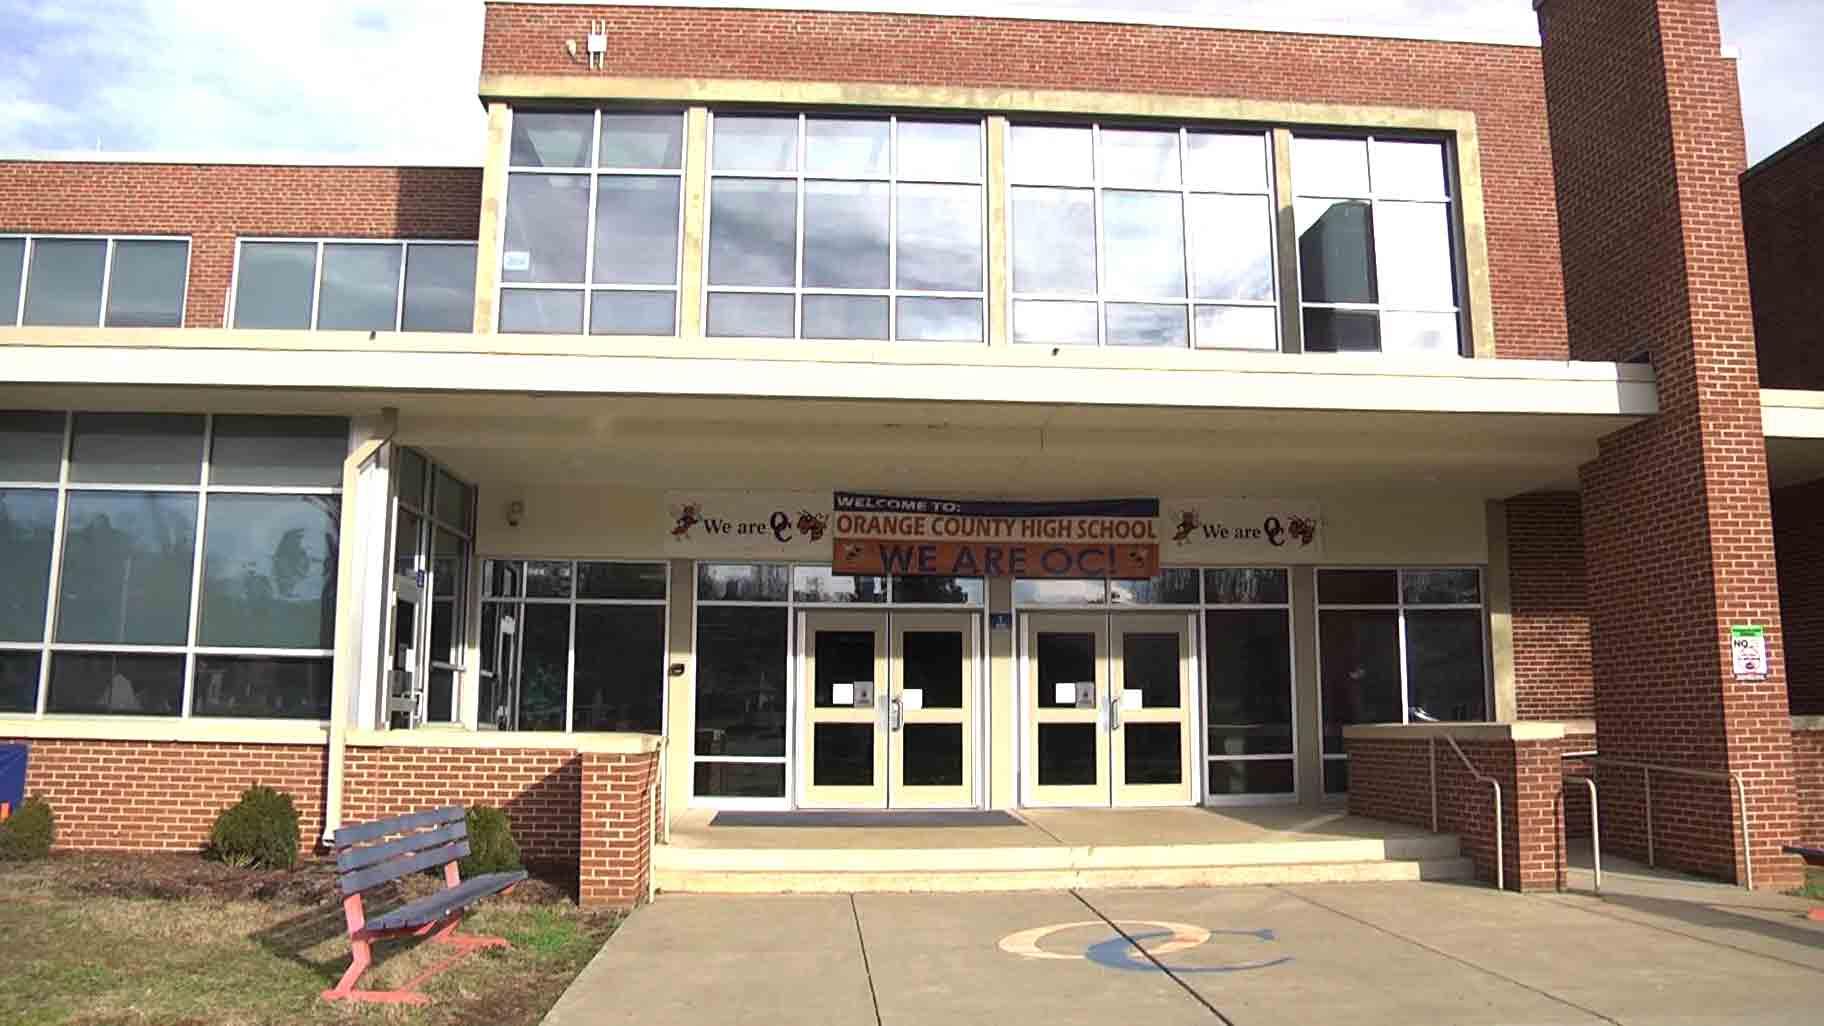 Orange County High School.